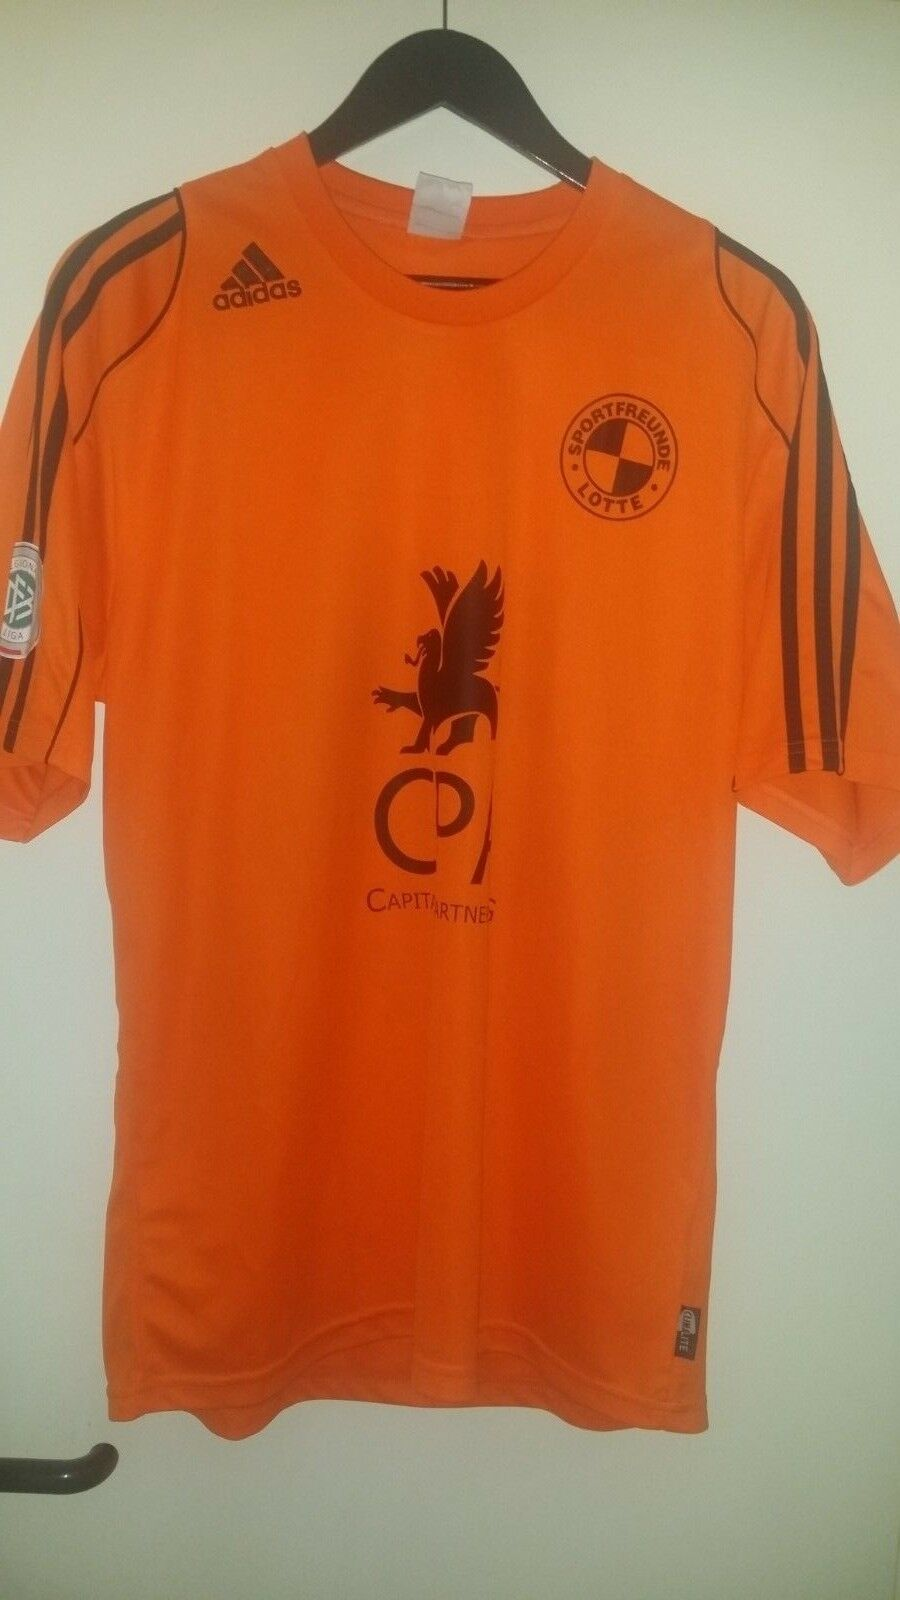 Trikot Fußball VfL Sportfreunde Lotte Lotte Lotte Regionalliga 2011 adidas L Orange 5fd682